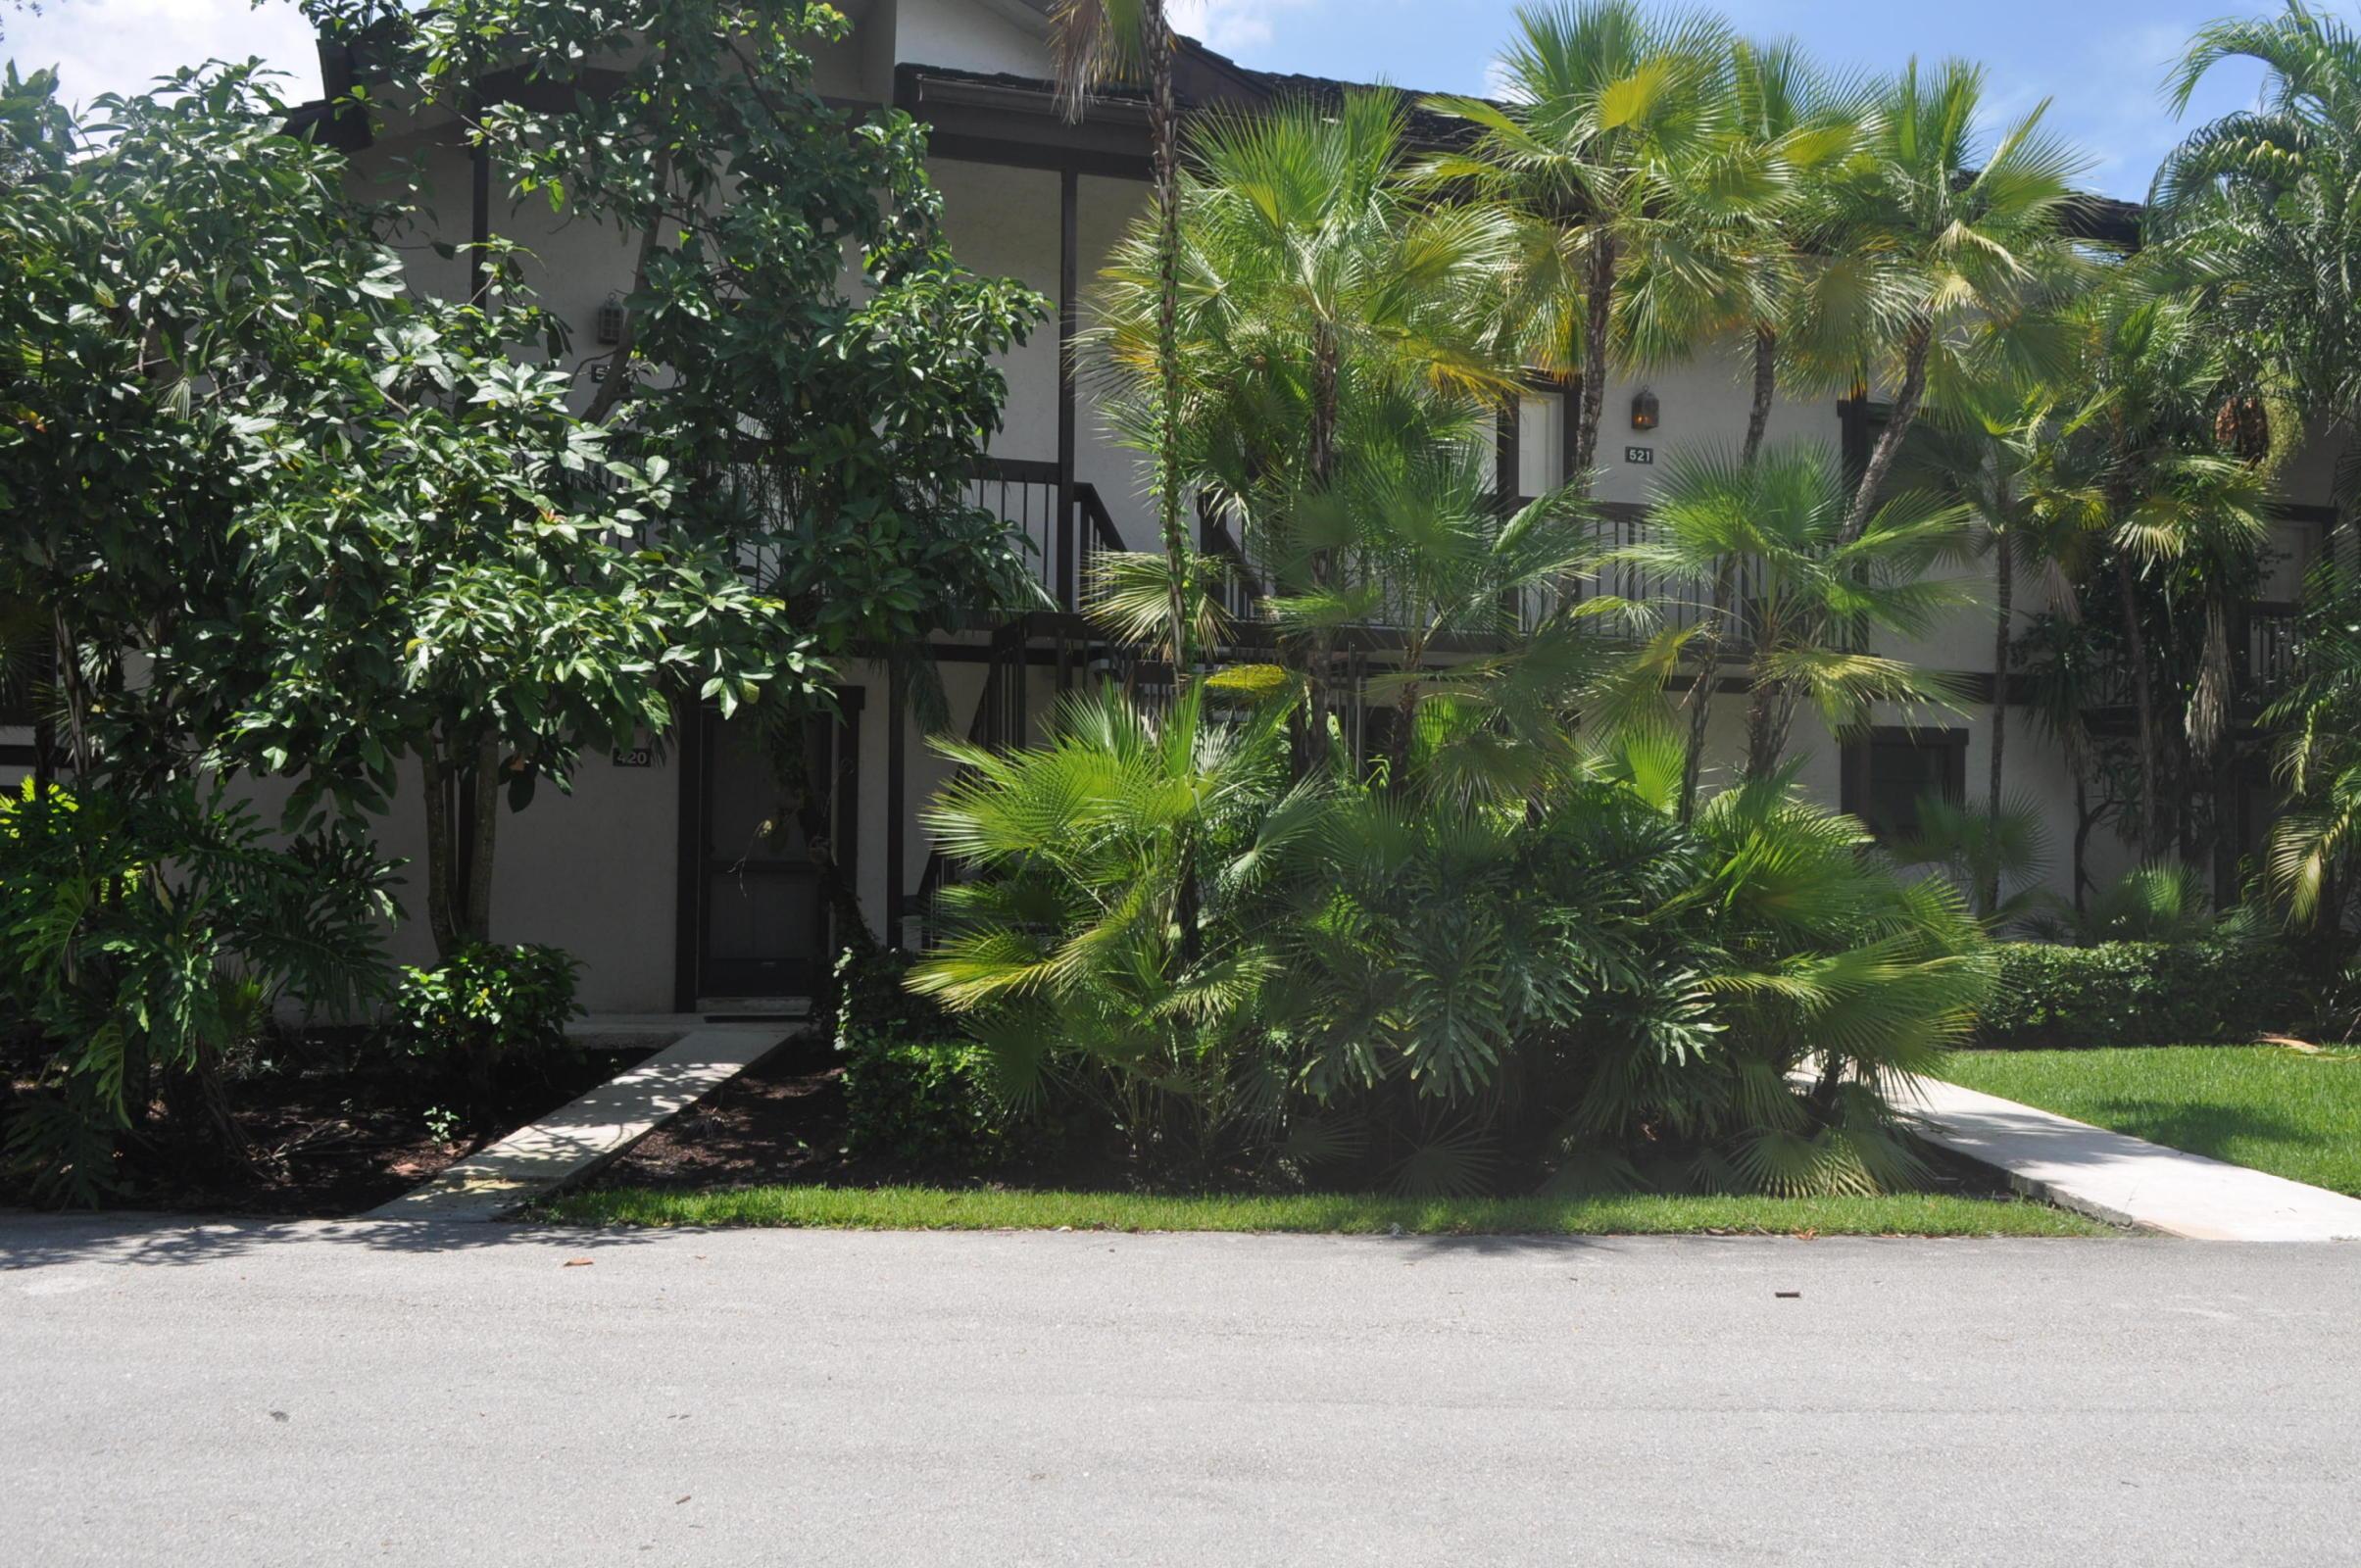 11863 Wimbledon Circle, Wellington, Florida 33414, 1 Bedroom Bedrooms, ,1 BathroomBathrooms,Condo/Coop,For Rent,Palm Beach Polo,Wimbledon,1,RX-10592151